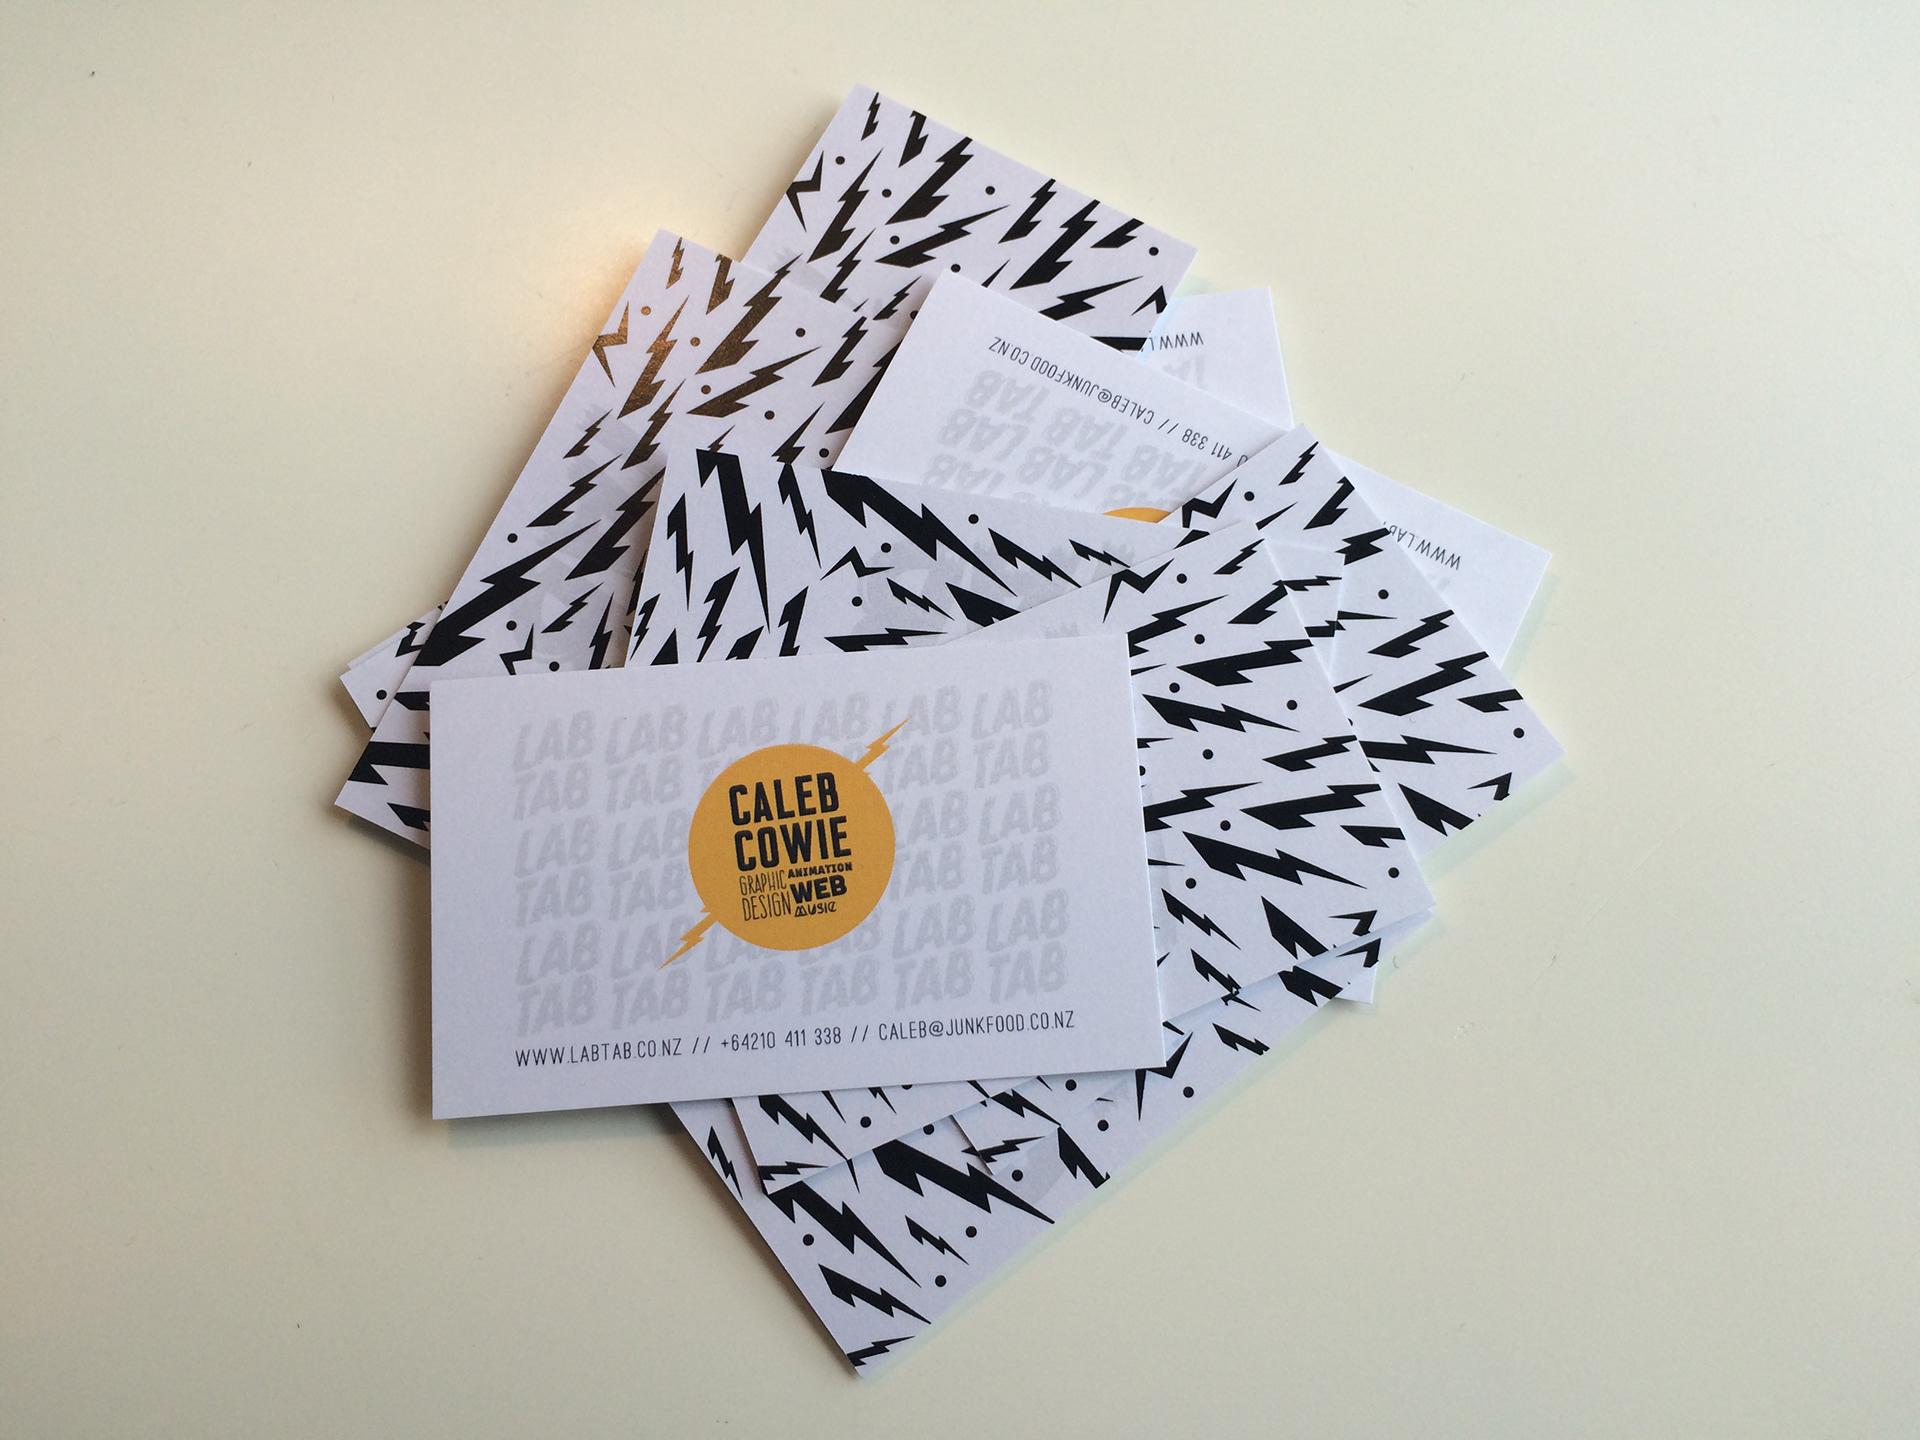 Caleb Cowie - Labtab business cards